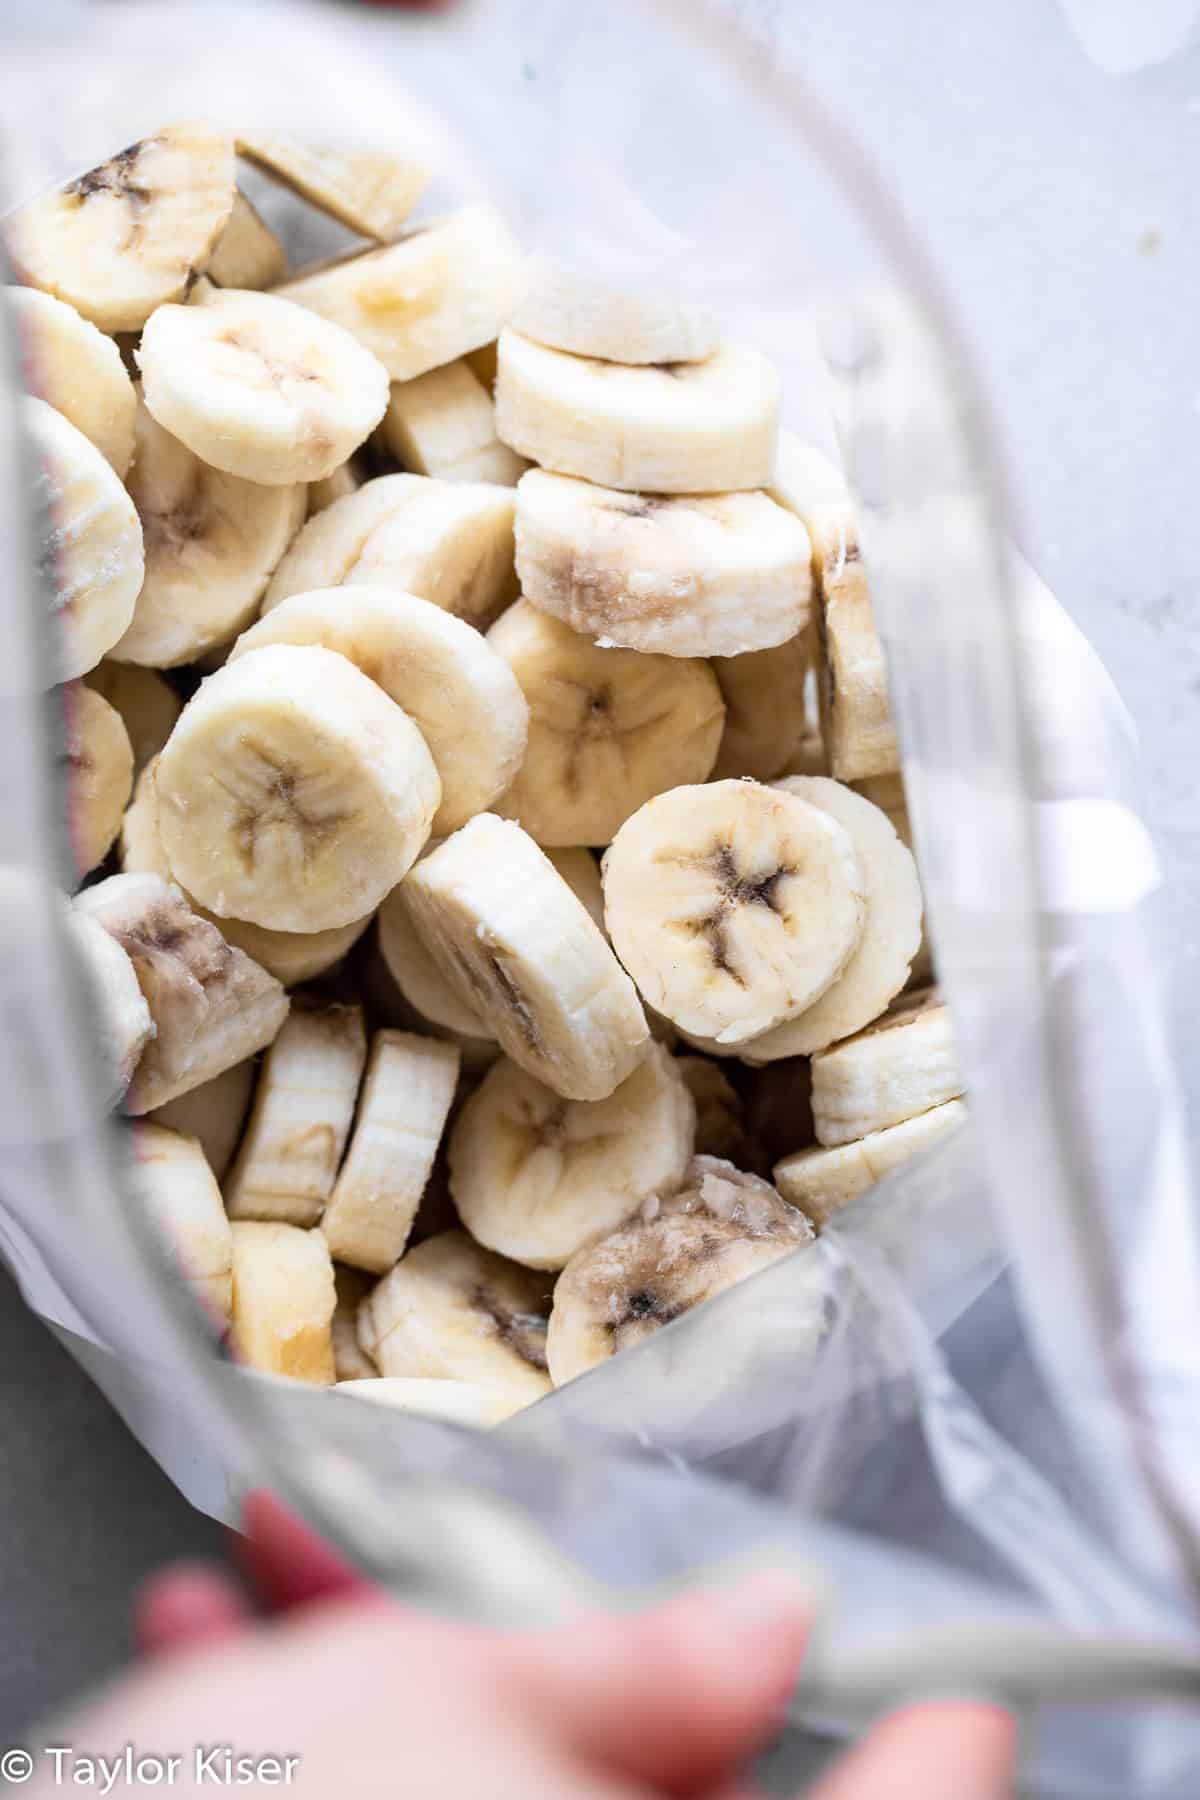 sliced bananas in a bag